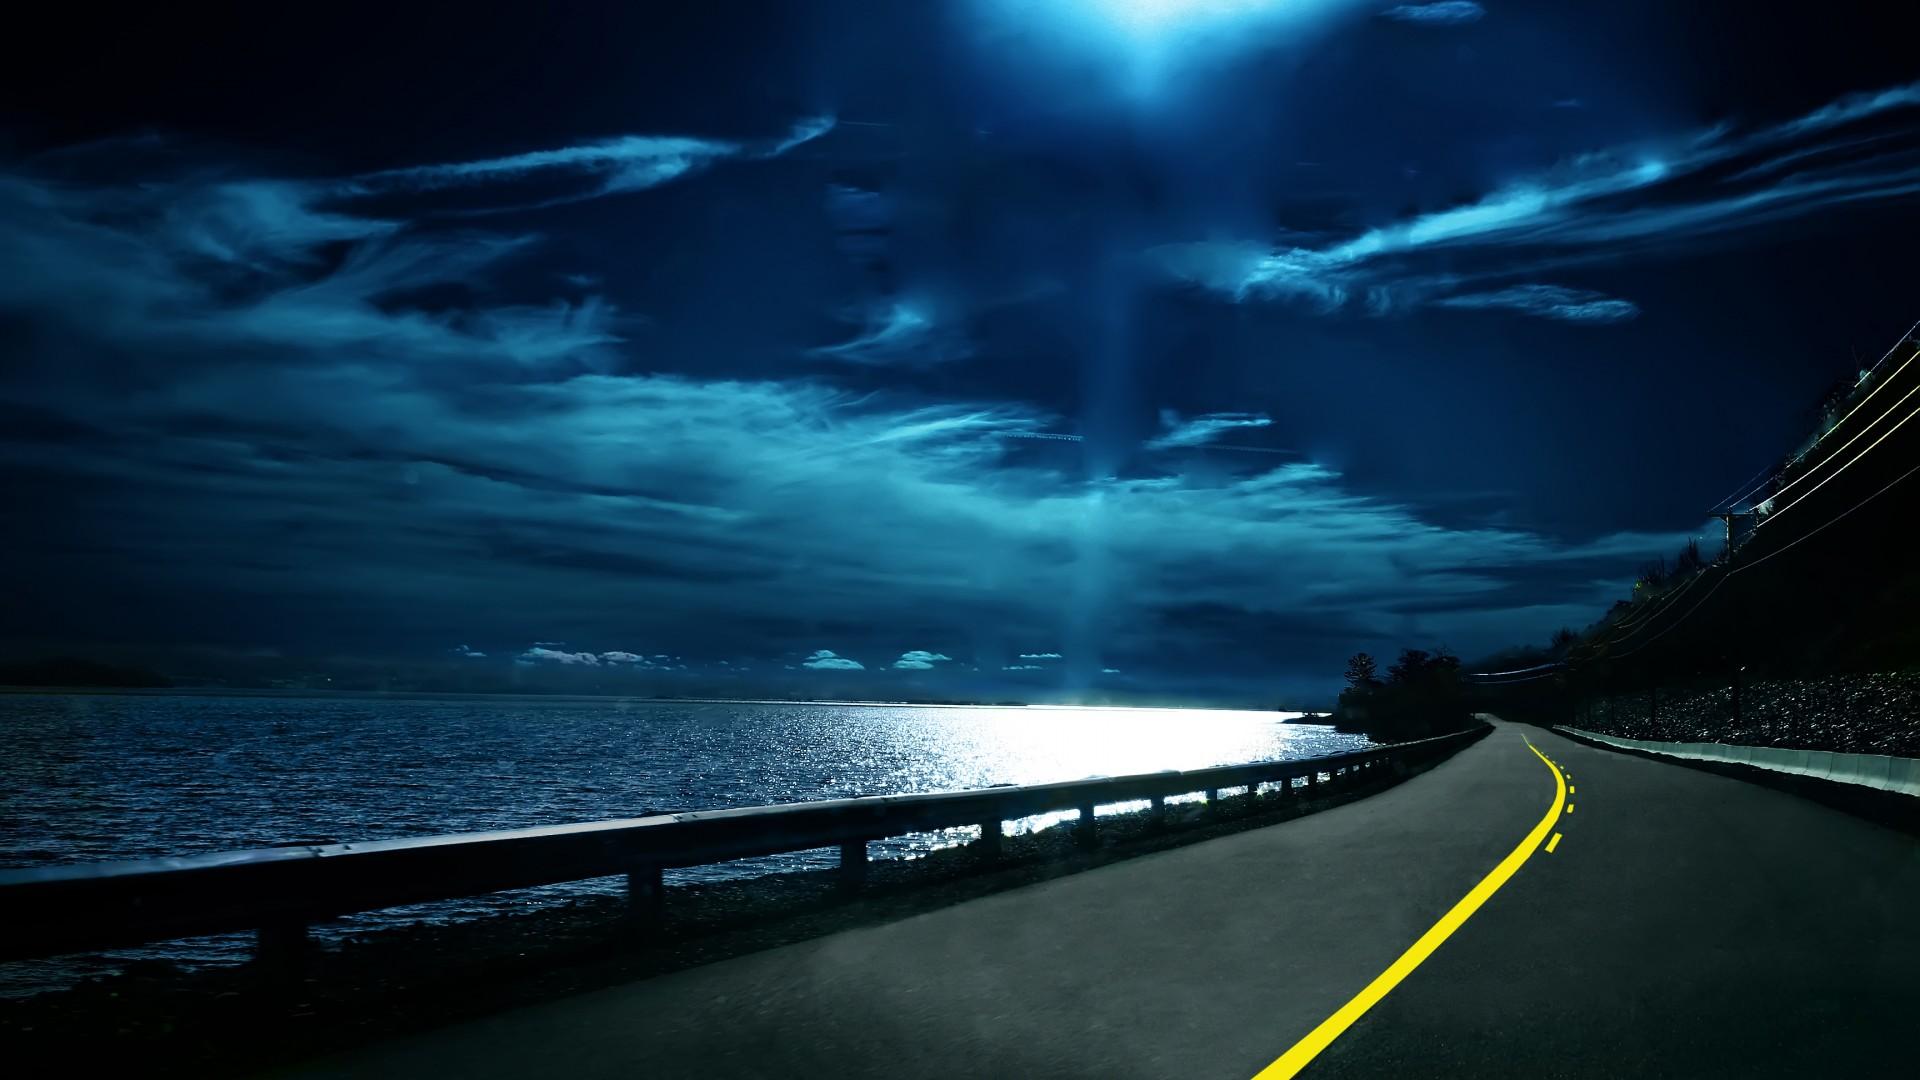 Beautiful Night Sky Wallpapers 24313 Wallpaper Wallpaper hd 1920x1080